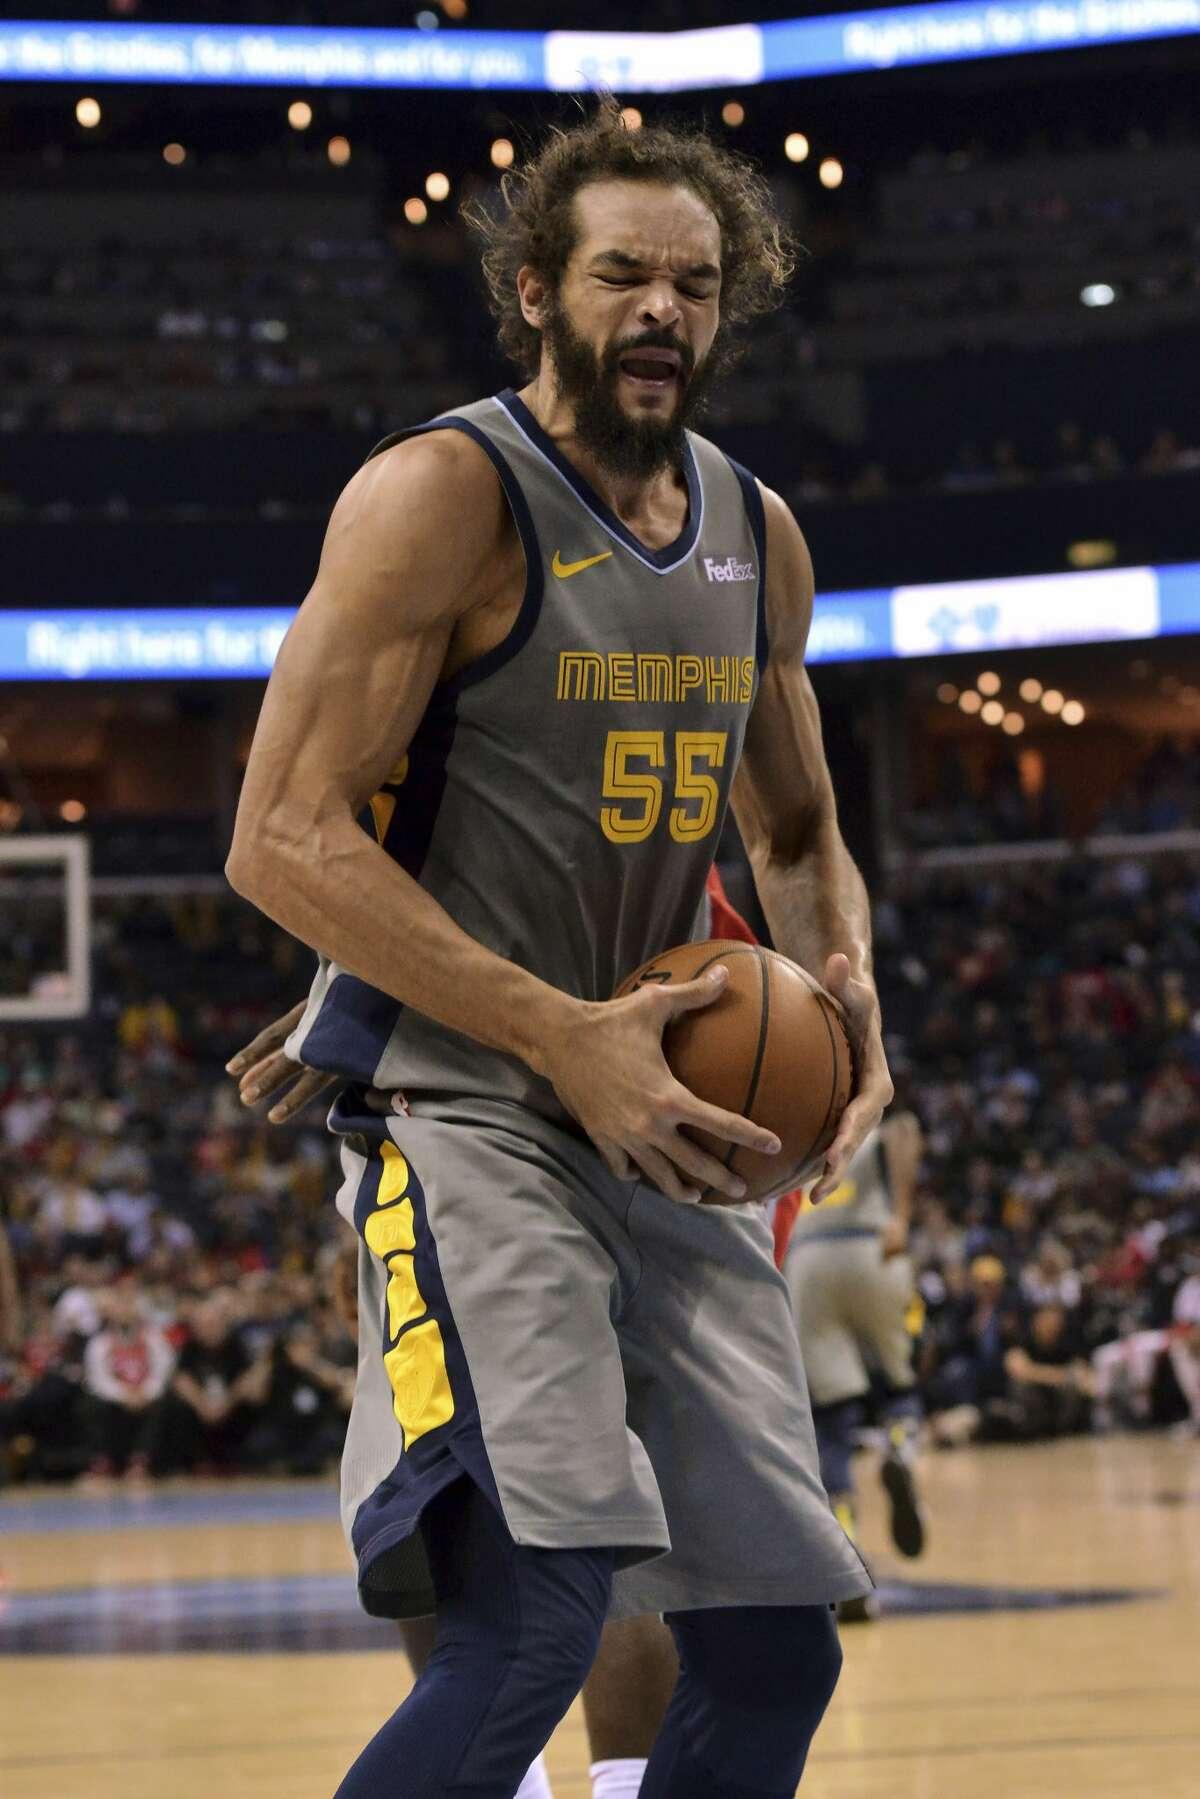 Memphis Grizzlies center Joakim Noah (55) grabs a loose ball in the second half of an NBA basketball game against the Houston Rockets Wednesday, March 20, 2019, in Memphis, Tenn. (AP Photo/Brandon Dill)